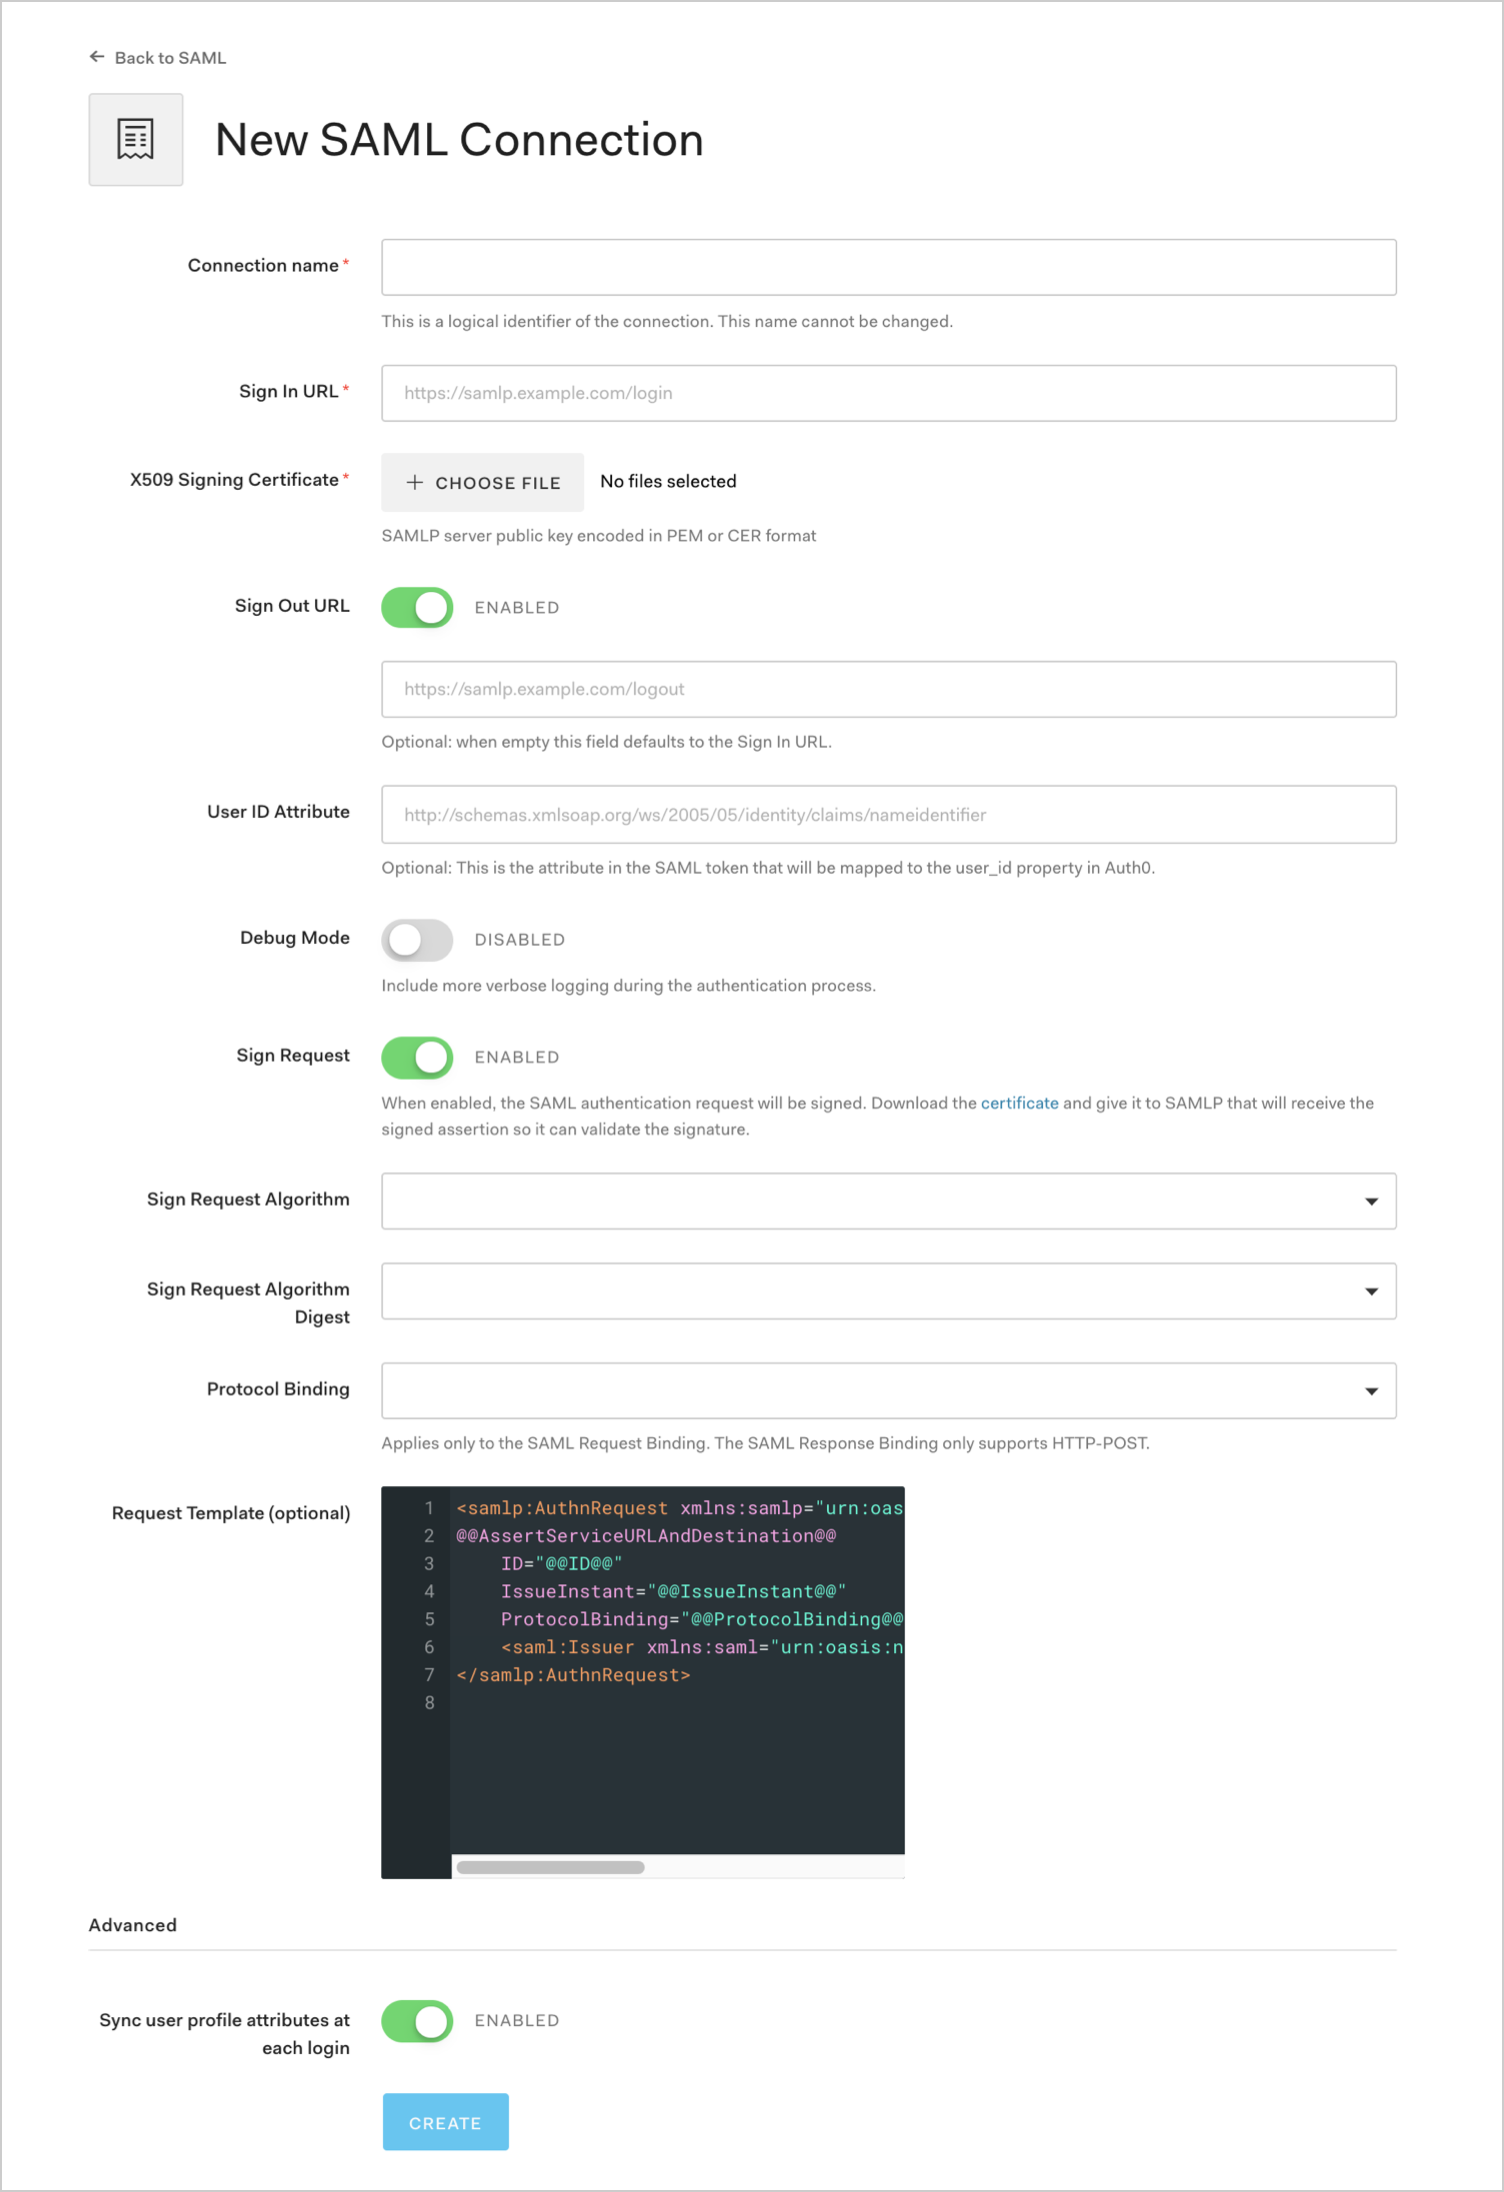 Configure SAML Settings